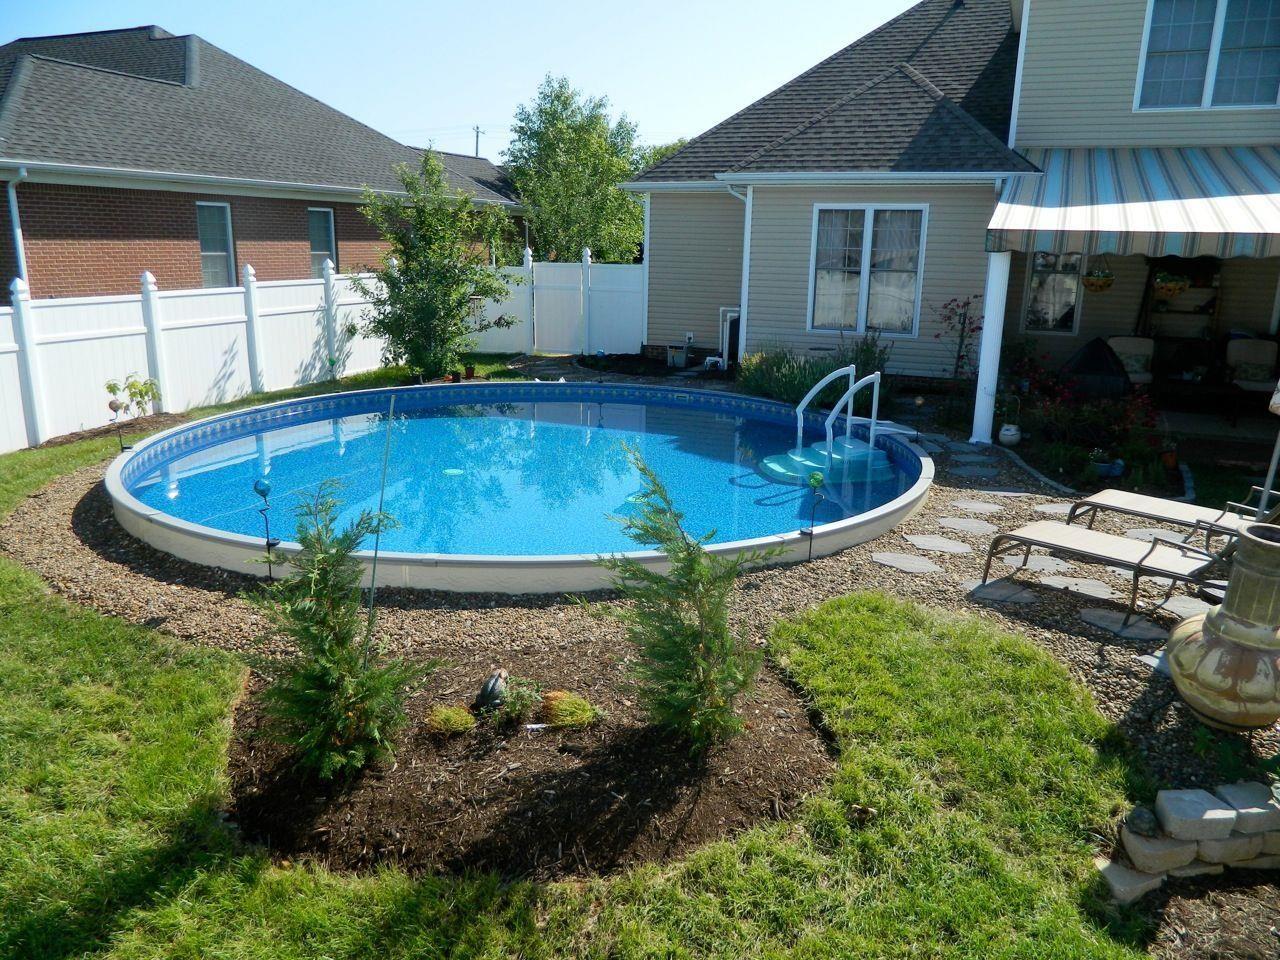 Swiming Pools Outdoor Flooring Options With Semi Inground